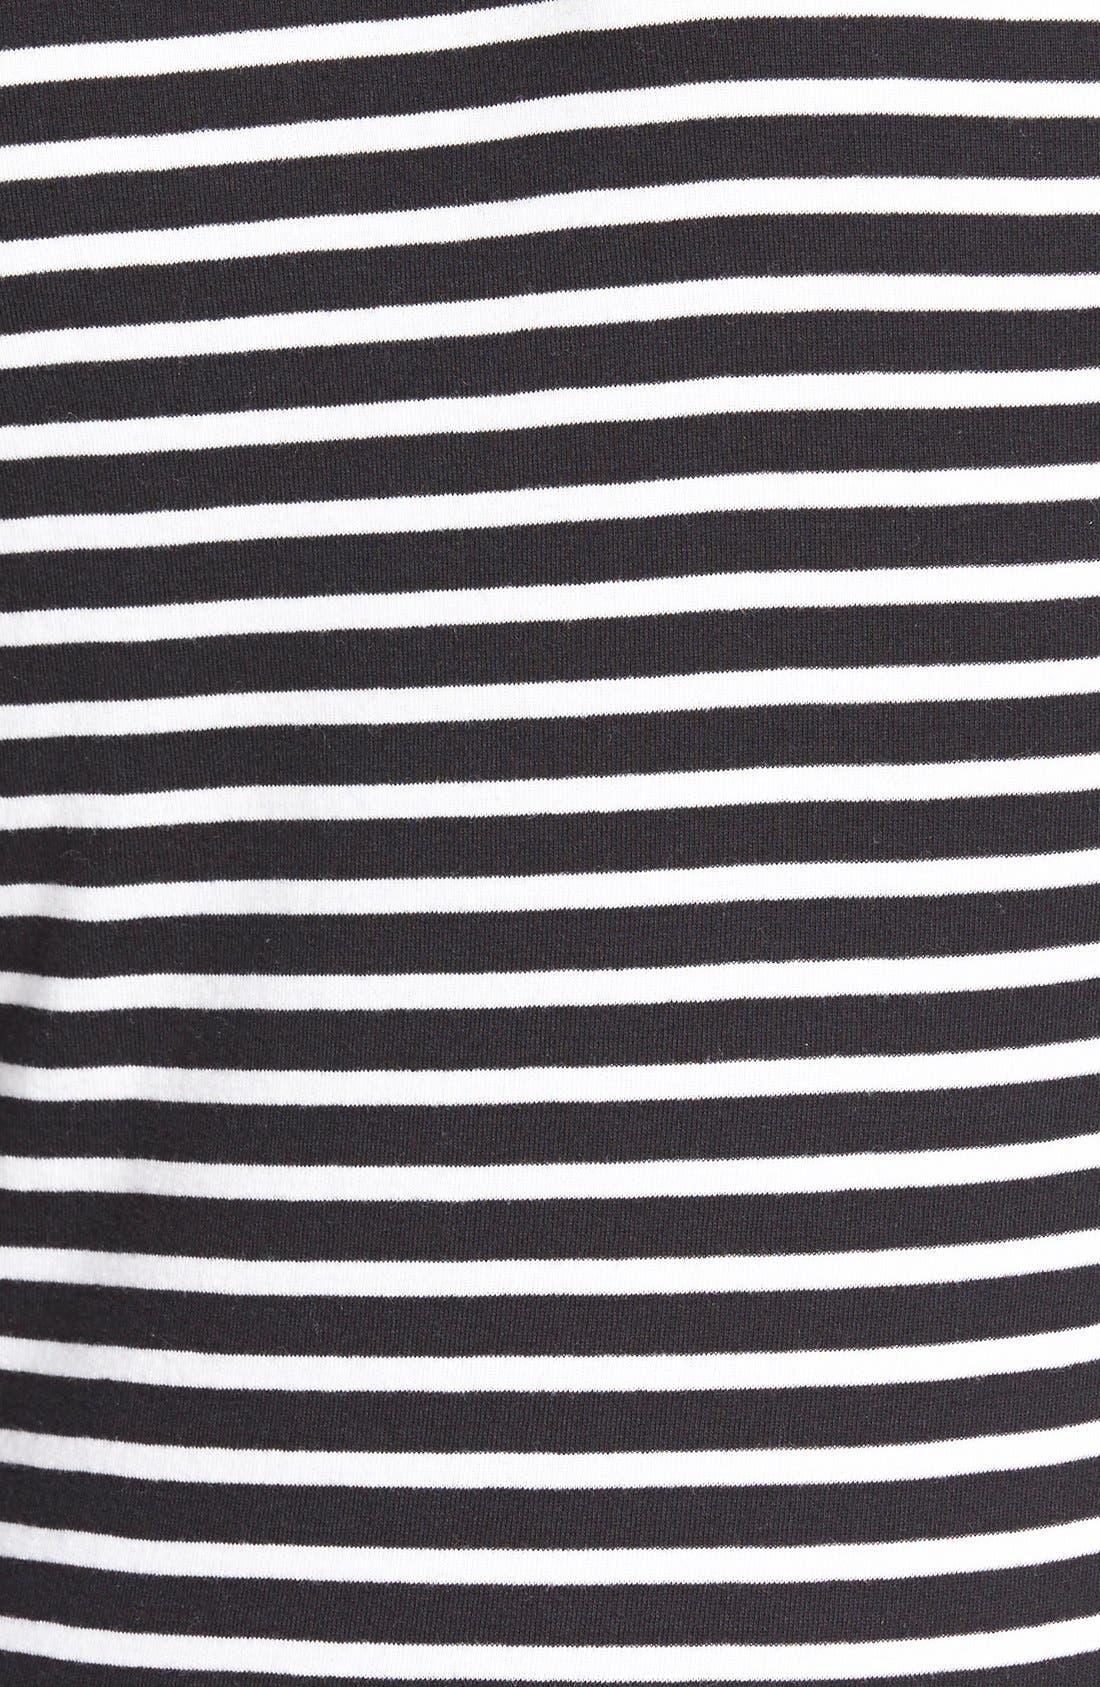 Alternate Image 3  - Caslon® Long Sleeve Scoop Neck Cotton Tee (Regular & Petite)